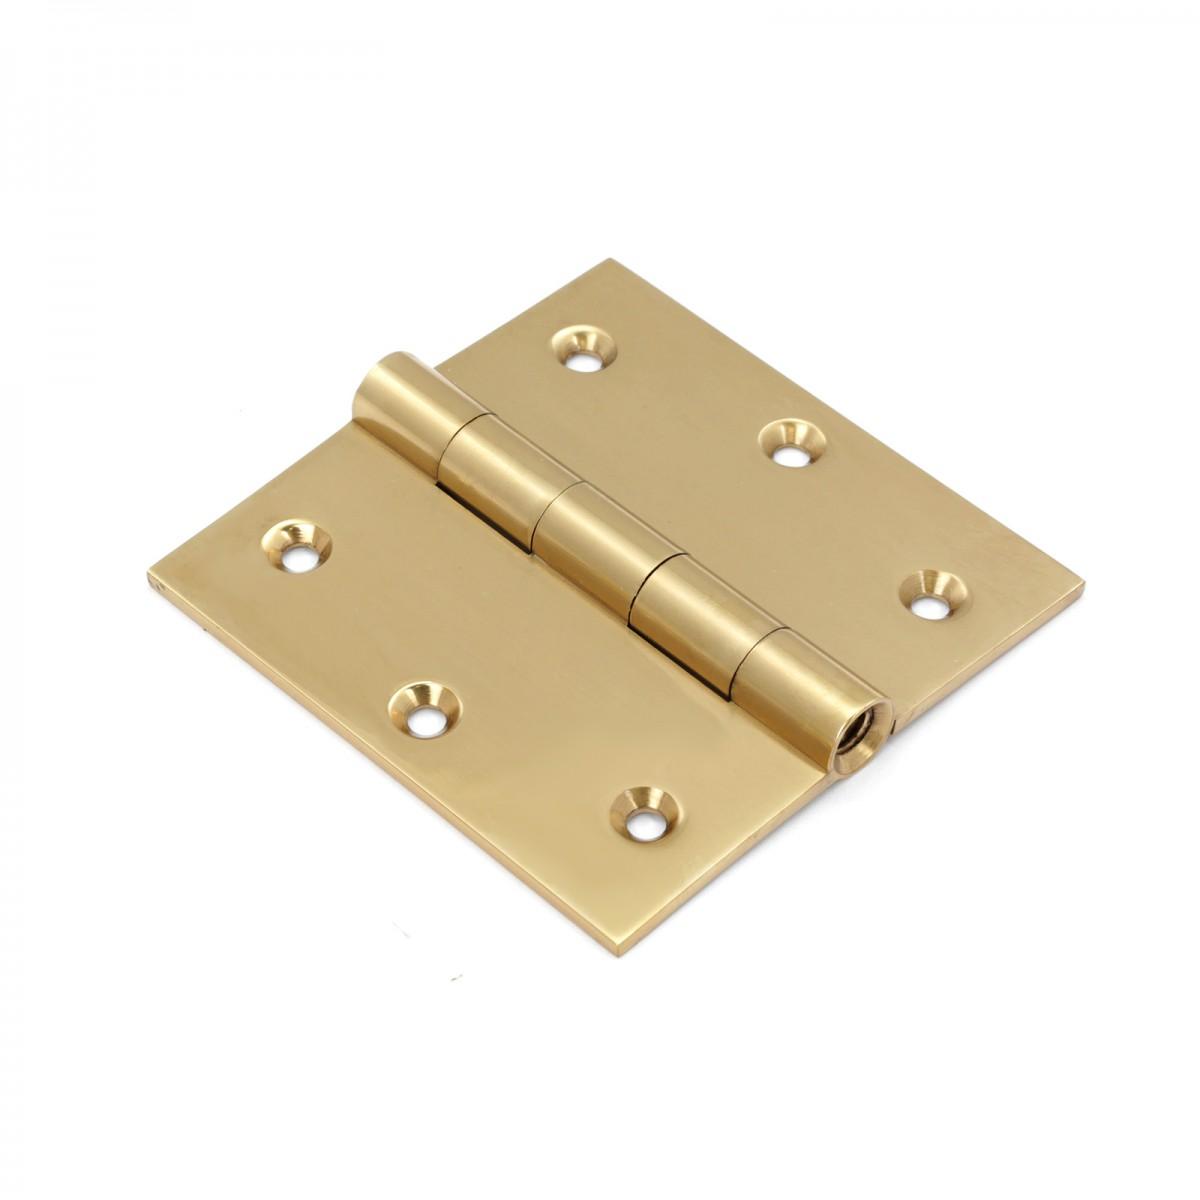 ... U003cPREu003eAntique Brass Door Hinges Bright Solid Brass Square Hinge 3.5 Inch  X 3.5 ...